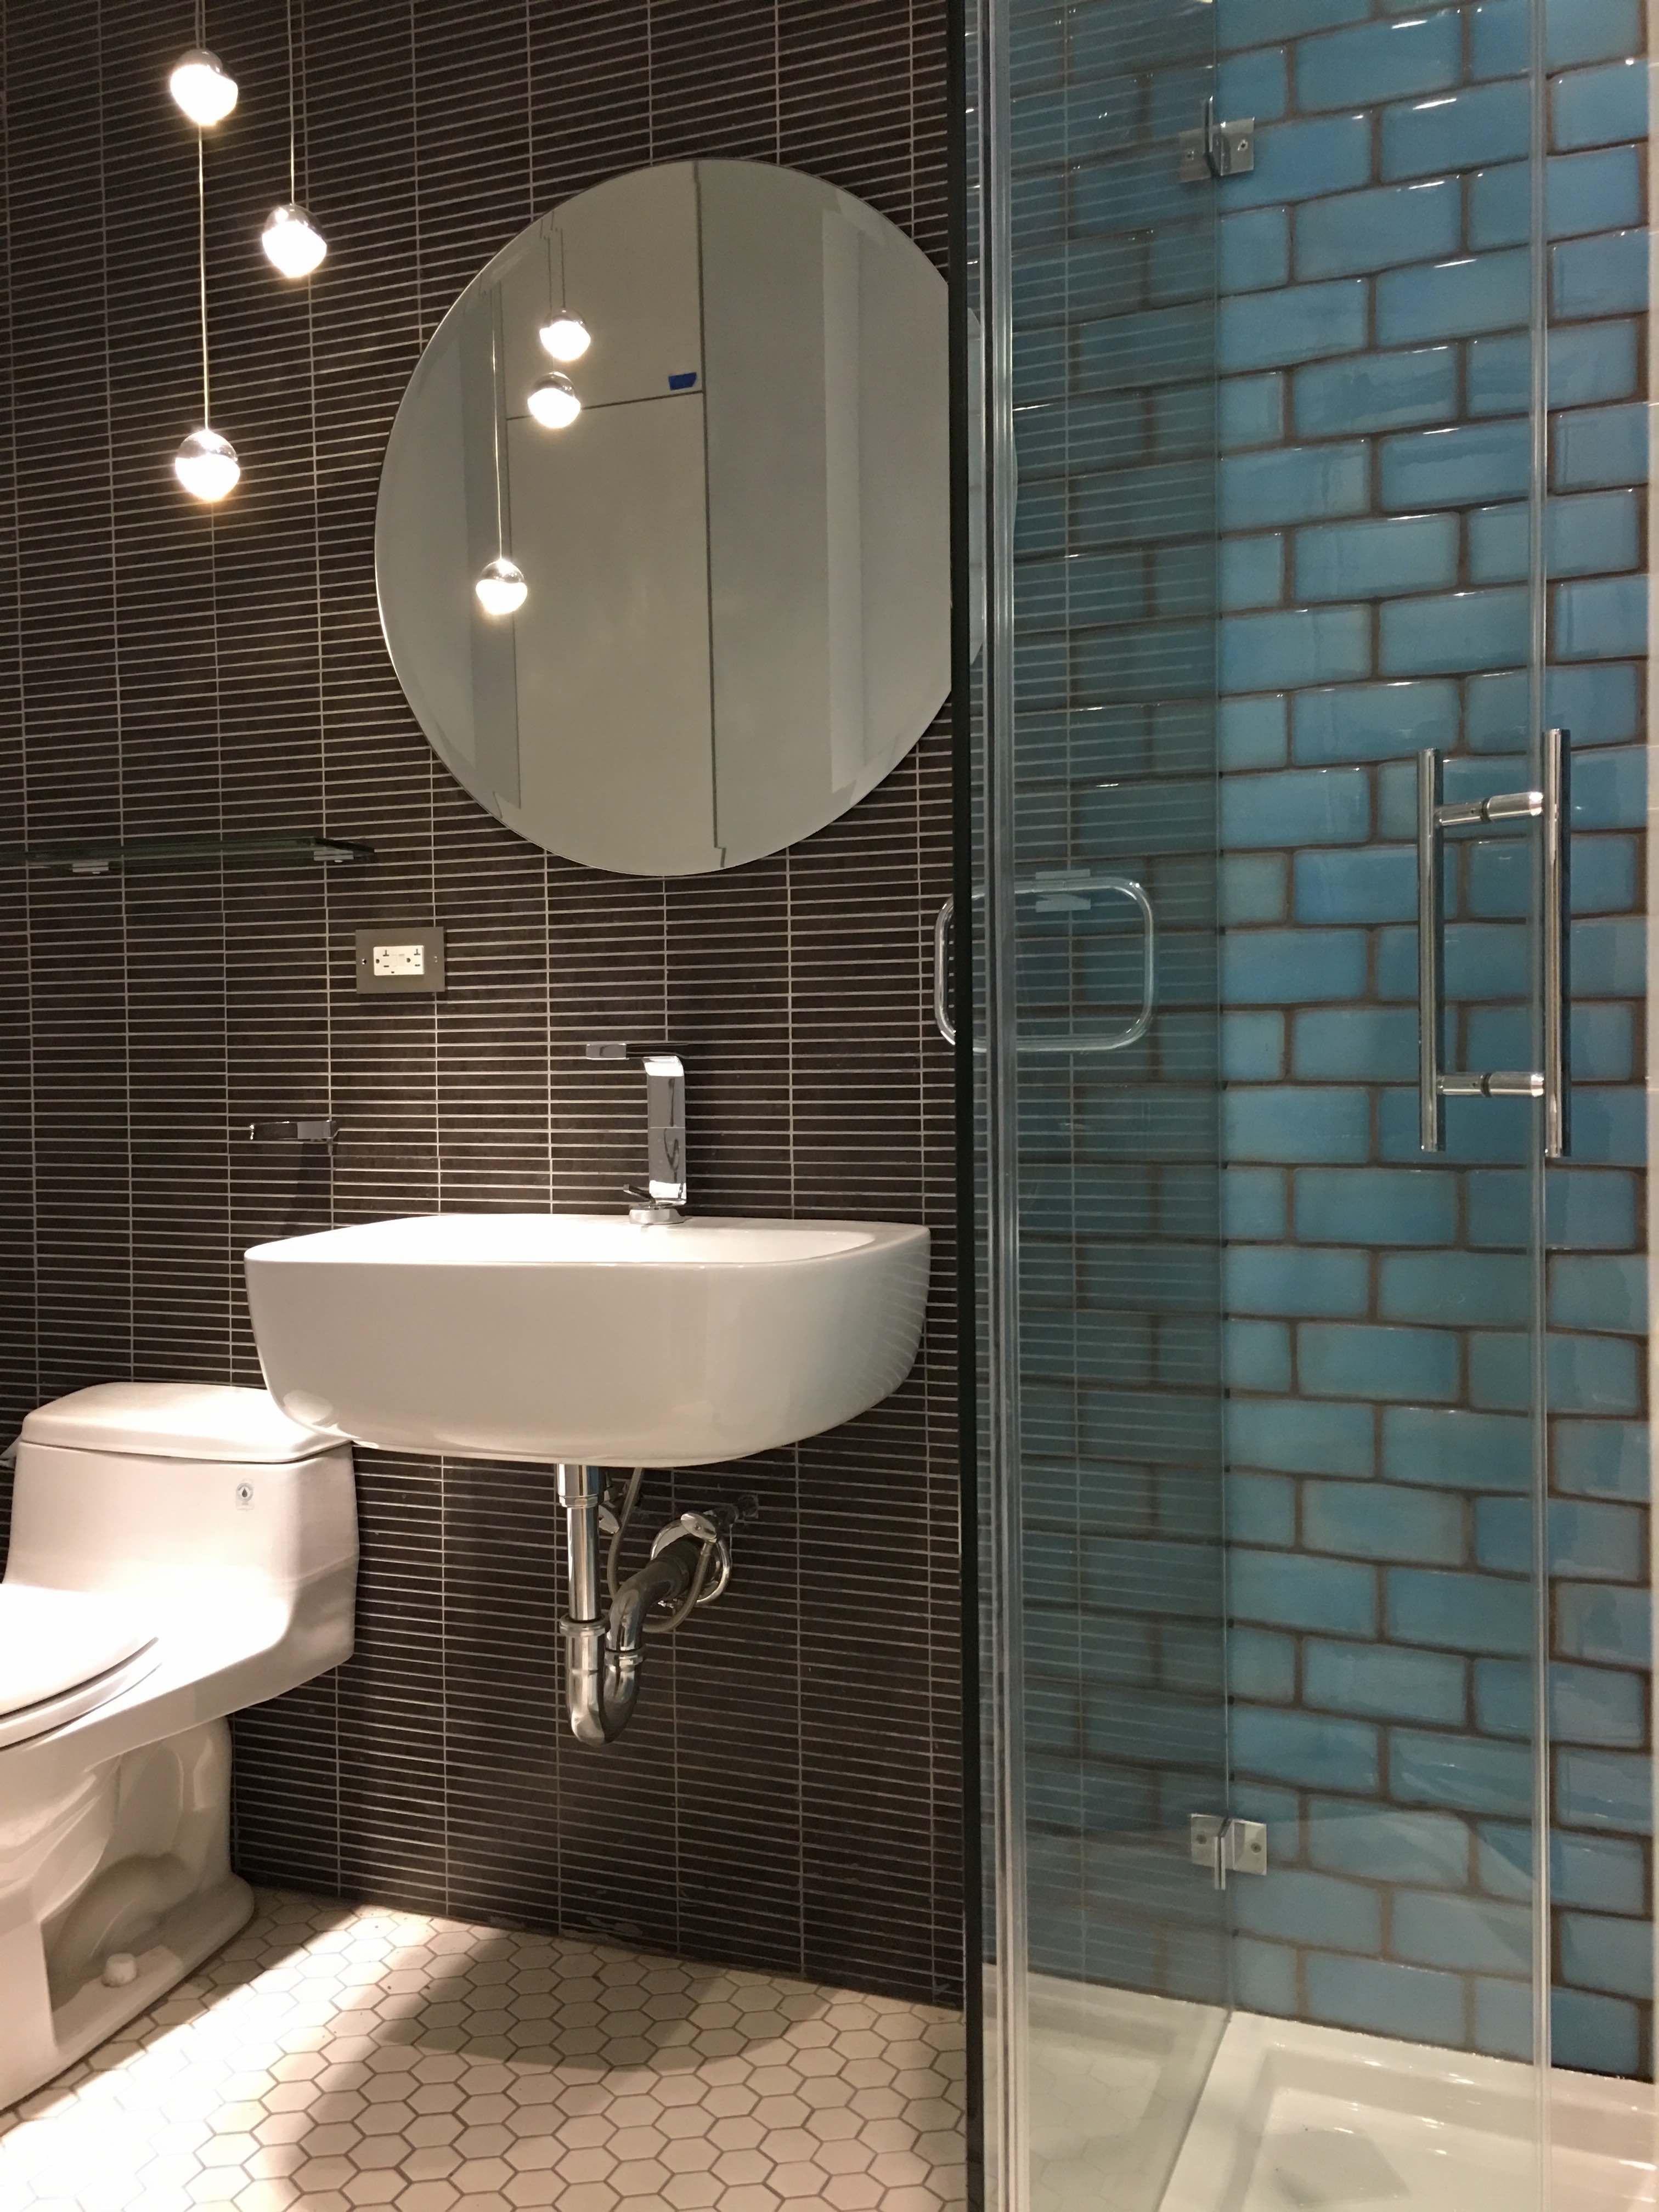 My dream bathroom 59